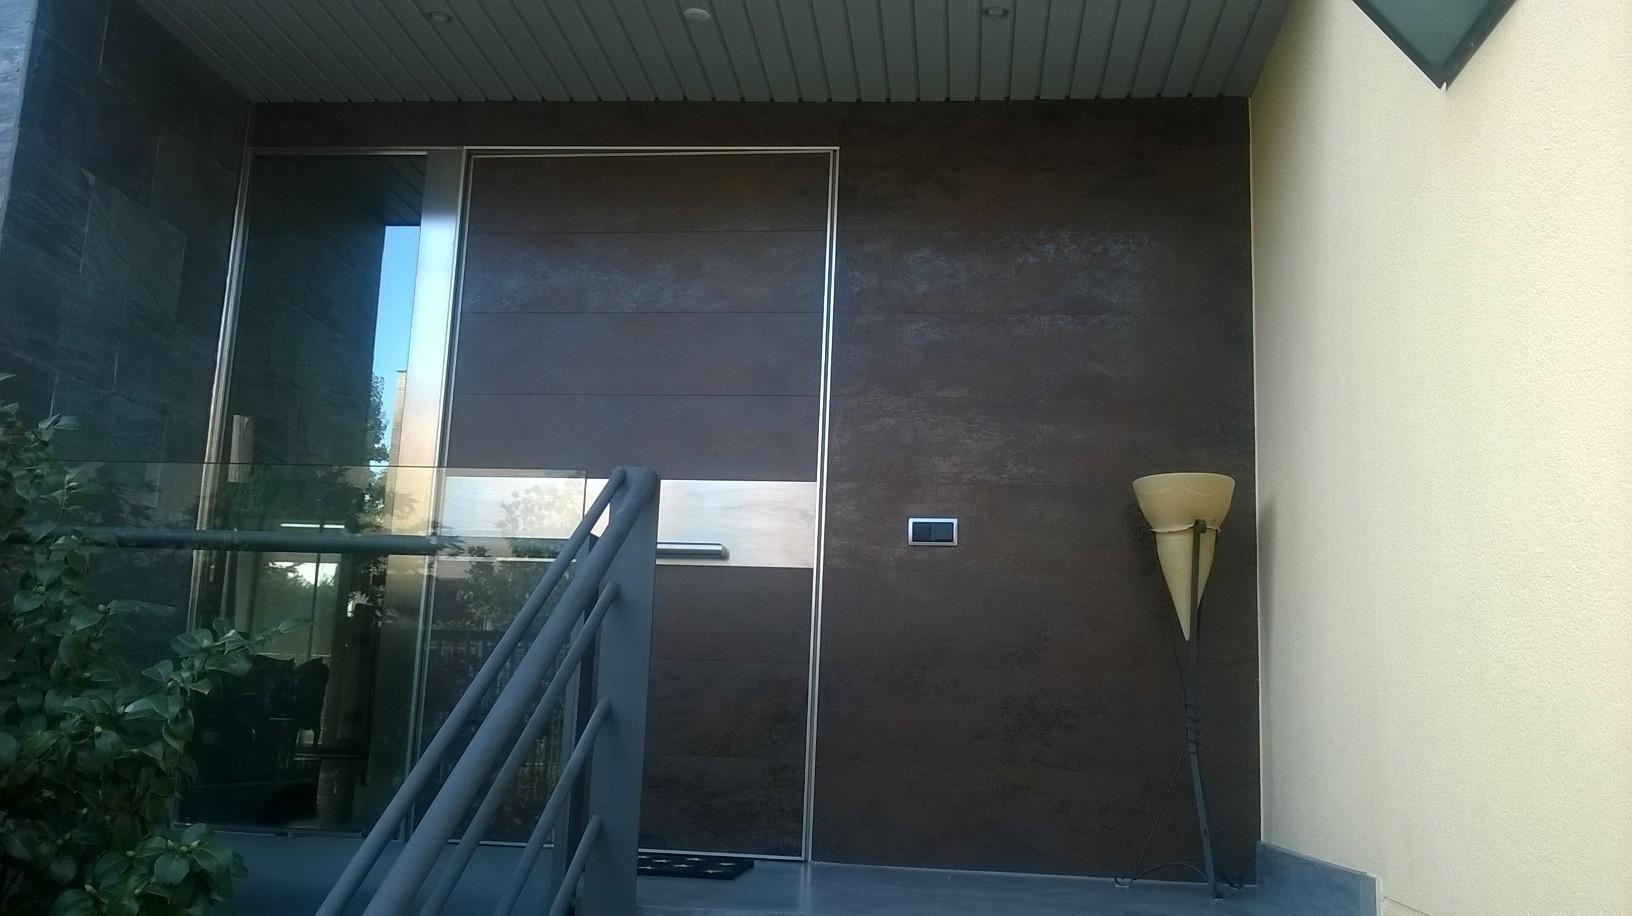 Timberplan obra vivienda nuevo espacio madrid 3 1632x916 c